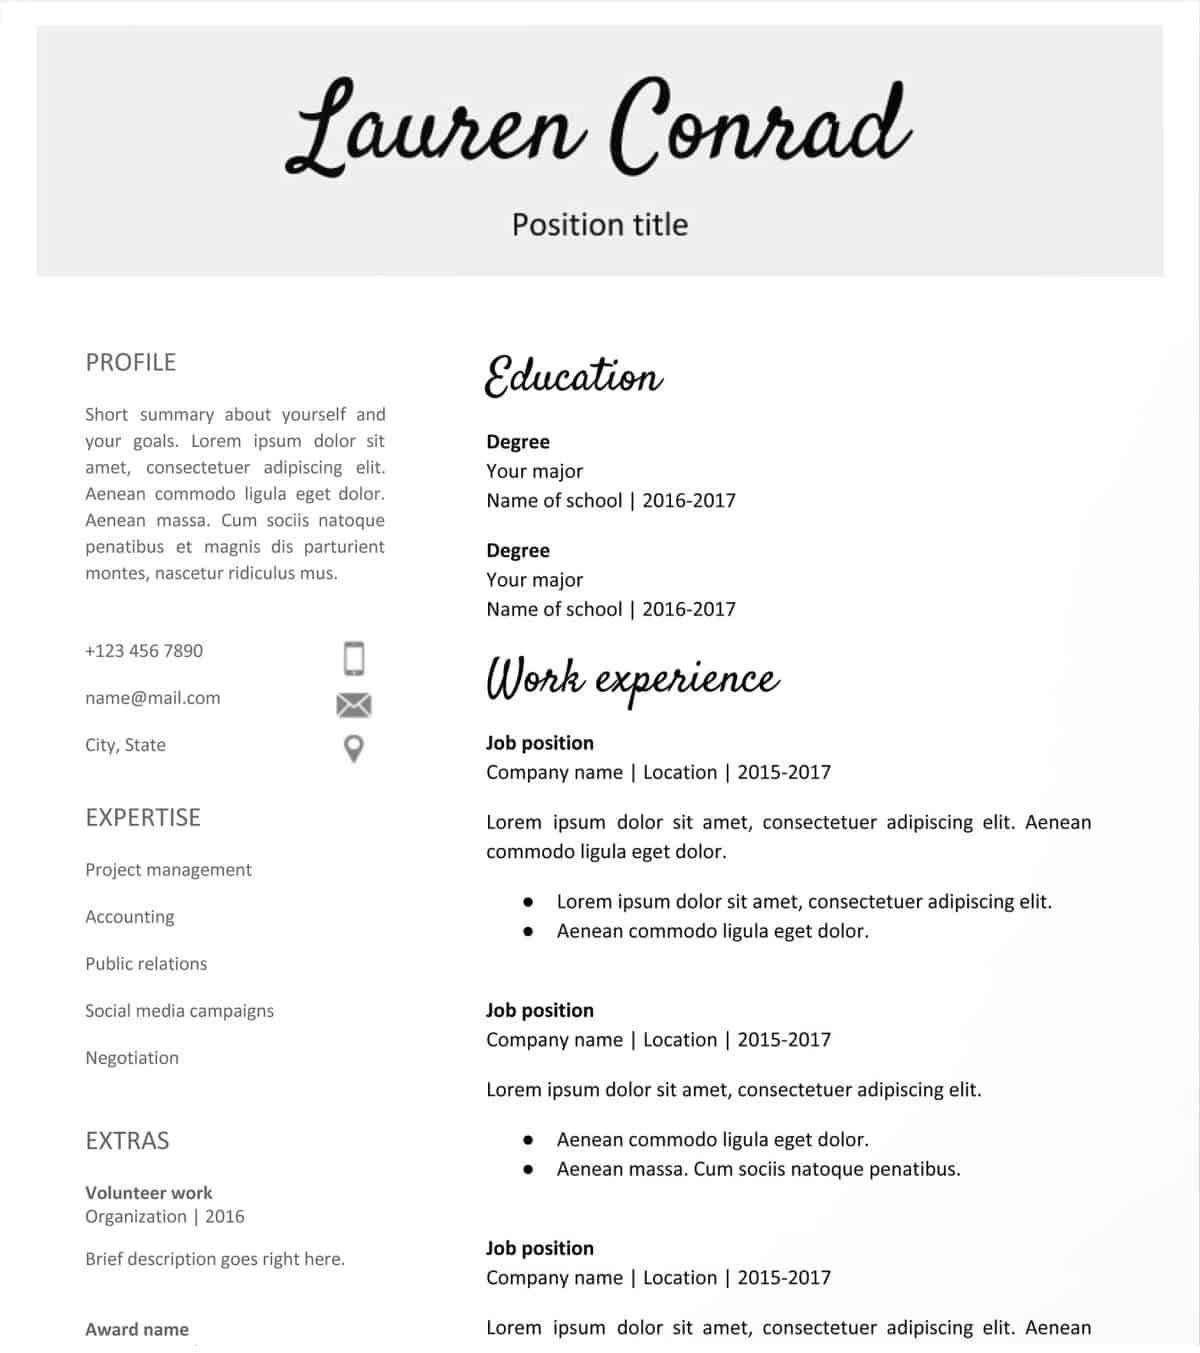 Make A Resume For Free Handwritten Headlines Google Docs Resume Template Free make a resume for free|wikiresume.com